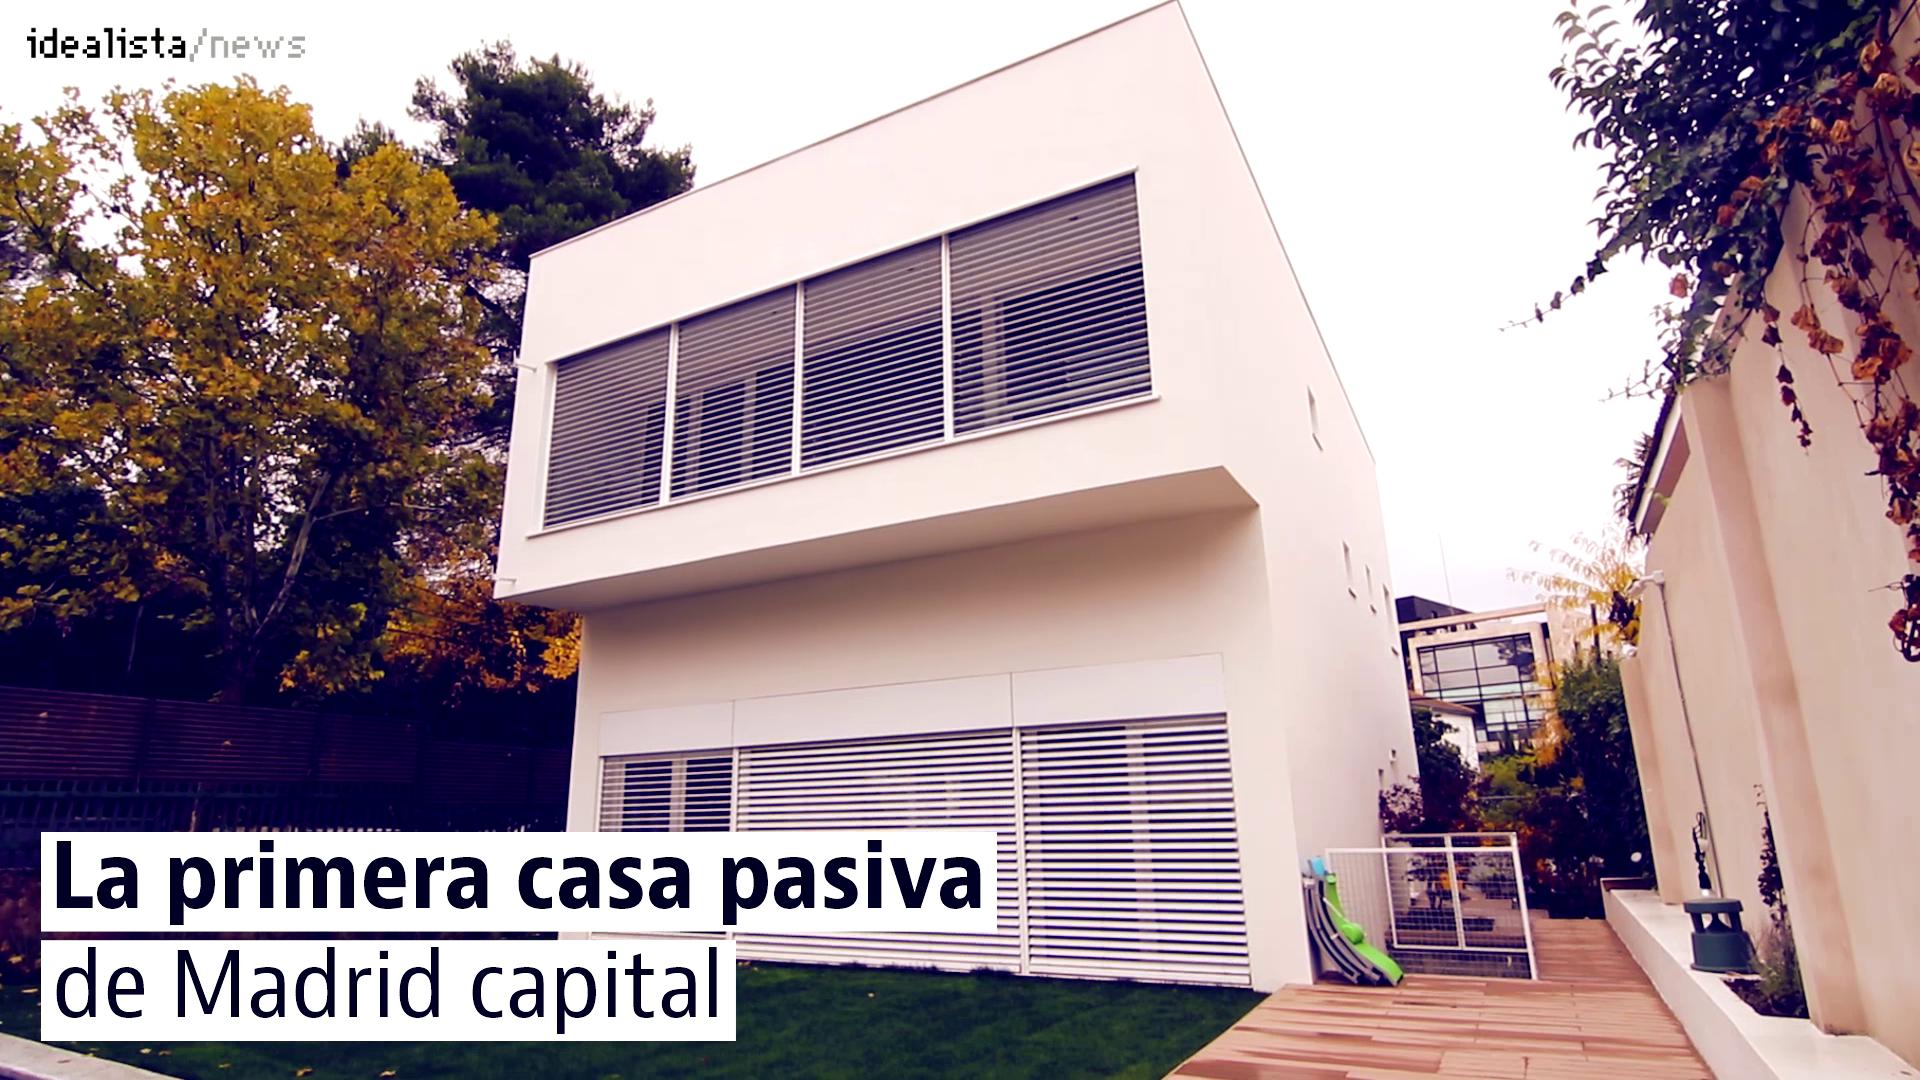 Las 10 claves para construir una casas pasiva as son Modelo de viviendas para construir